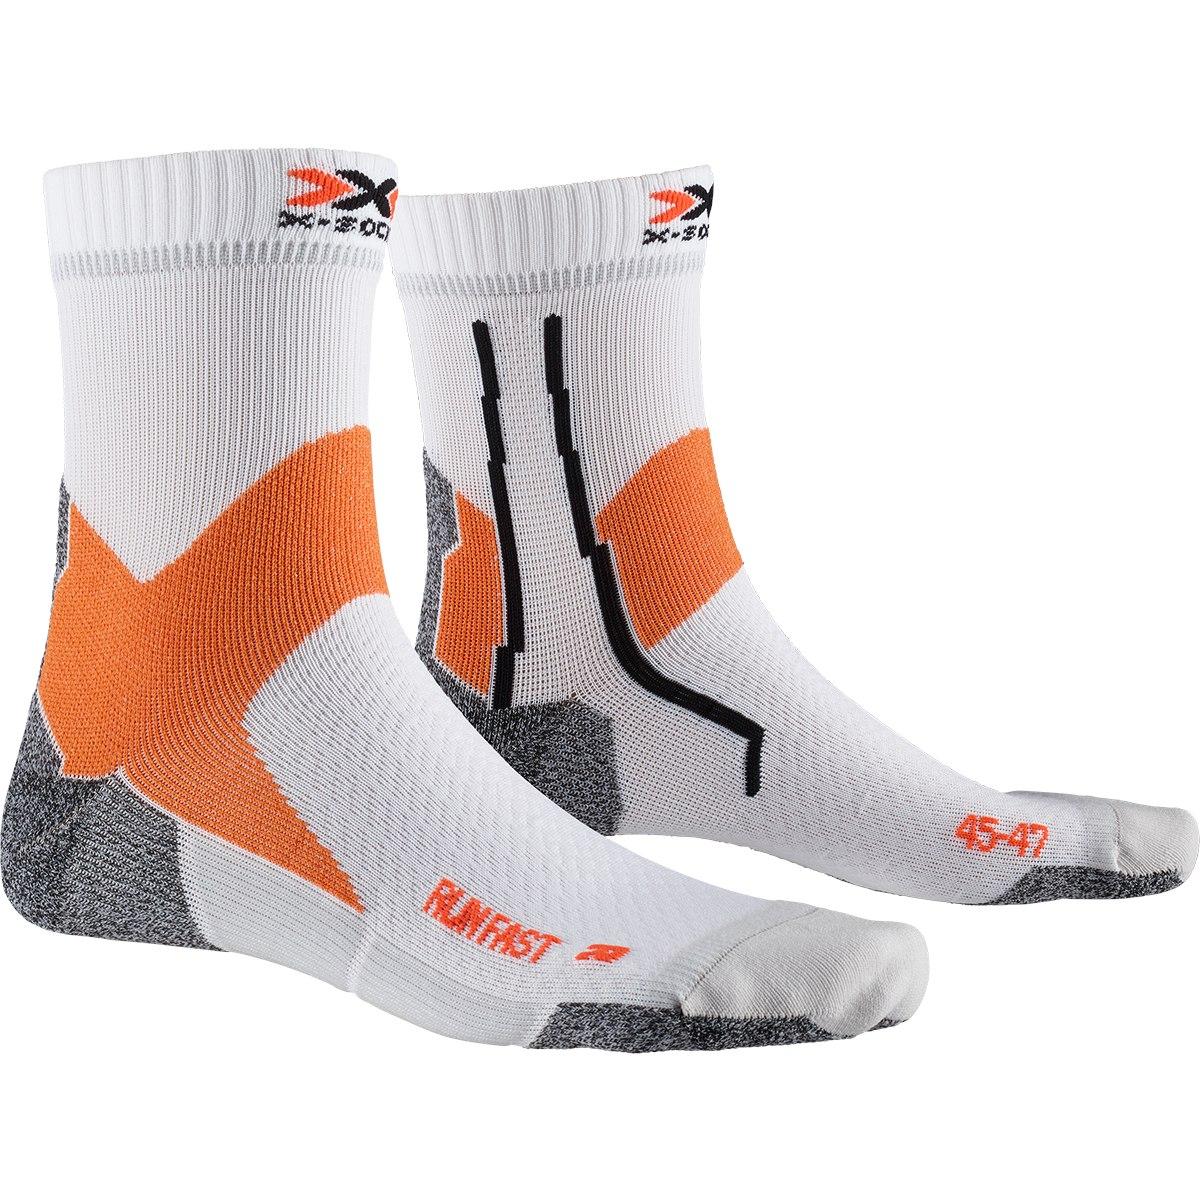 X-Socks Run Fast Laufsocken - arctic white/sunset orange